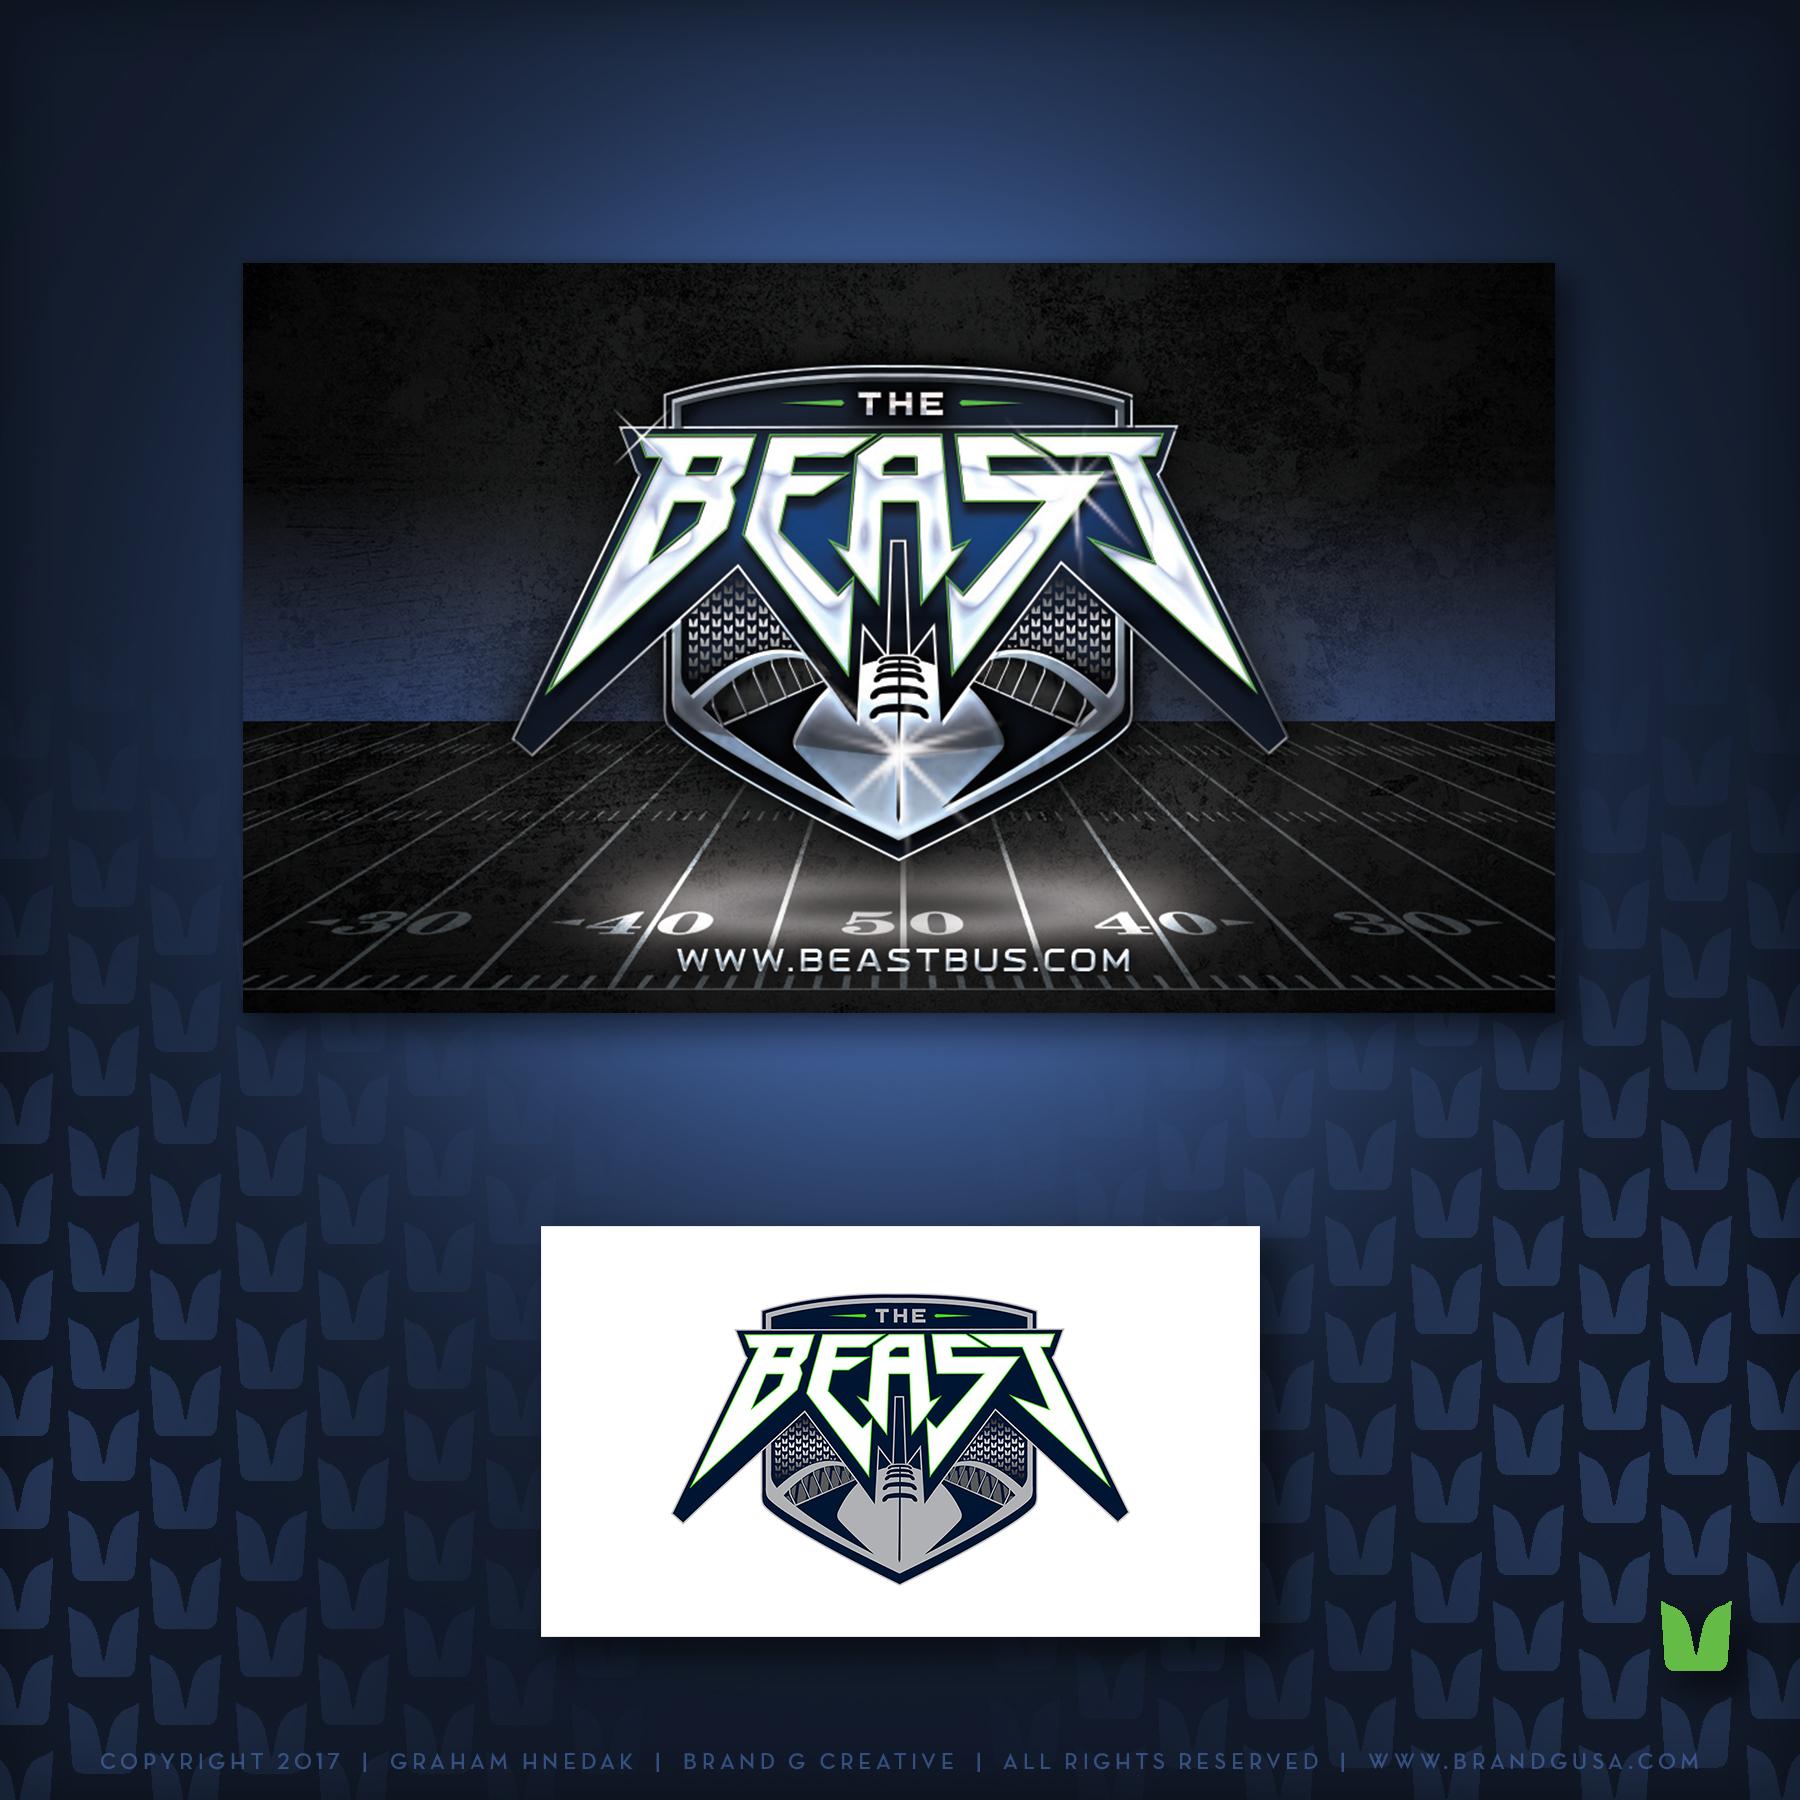 Beast Bus Logo Enhancement from Flat - Business Card Back Shown